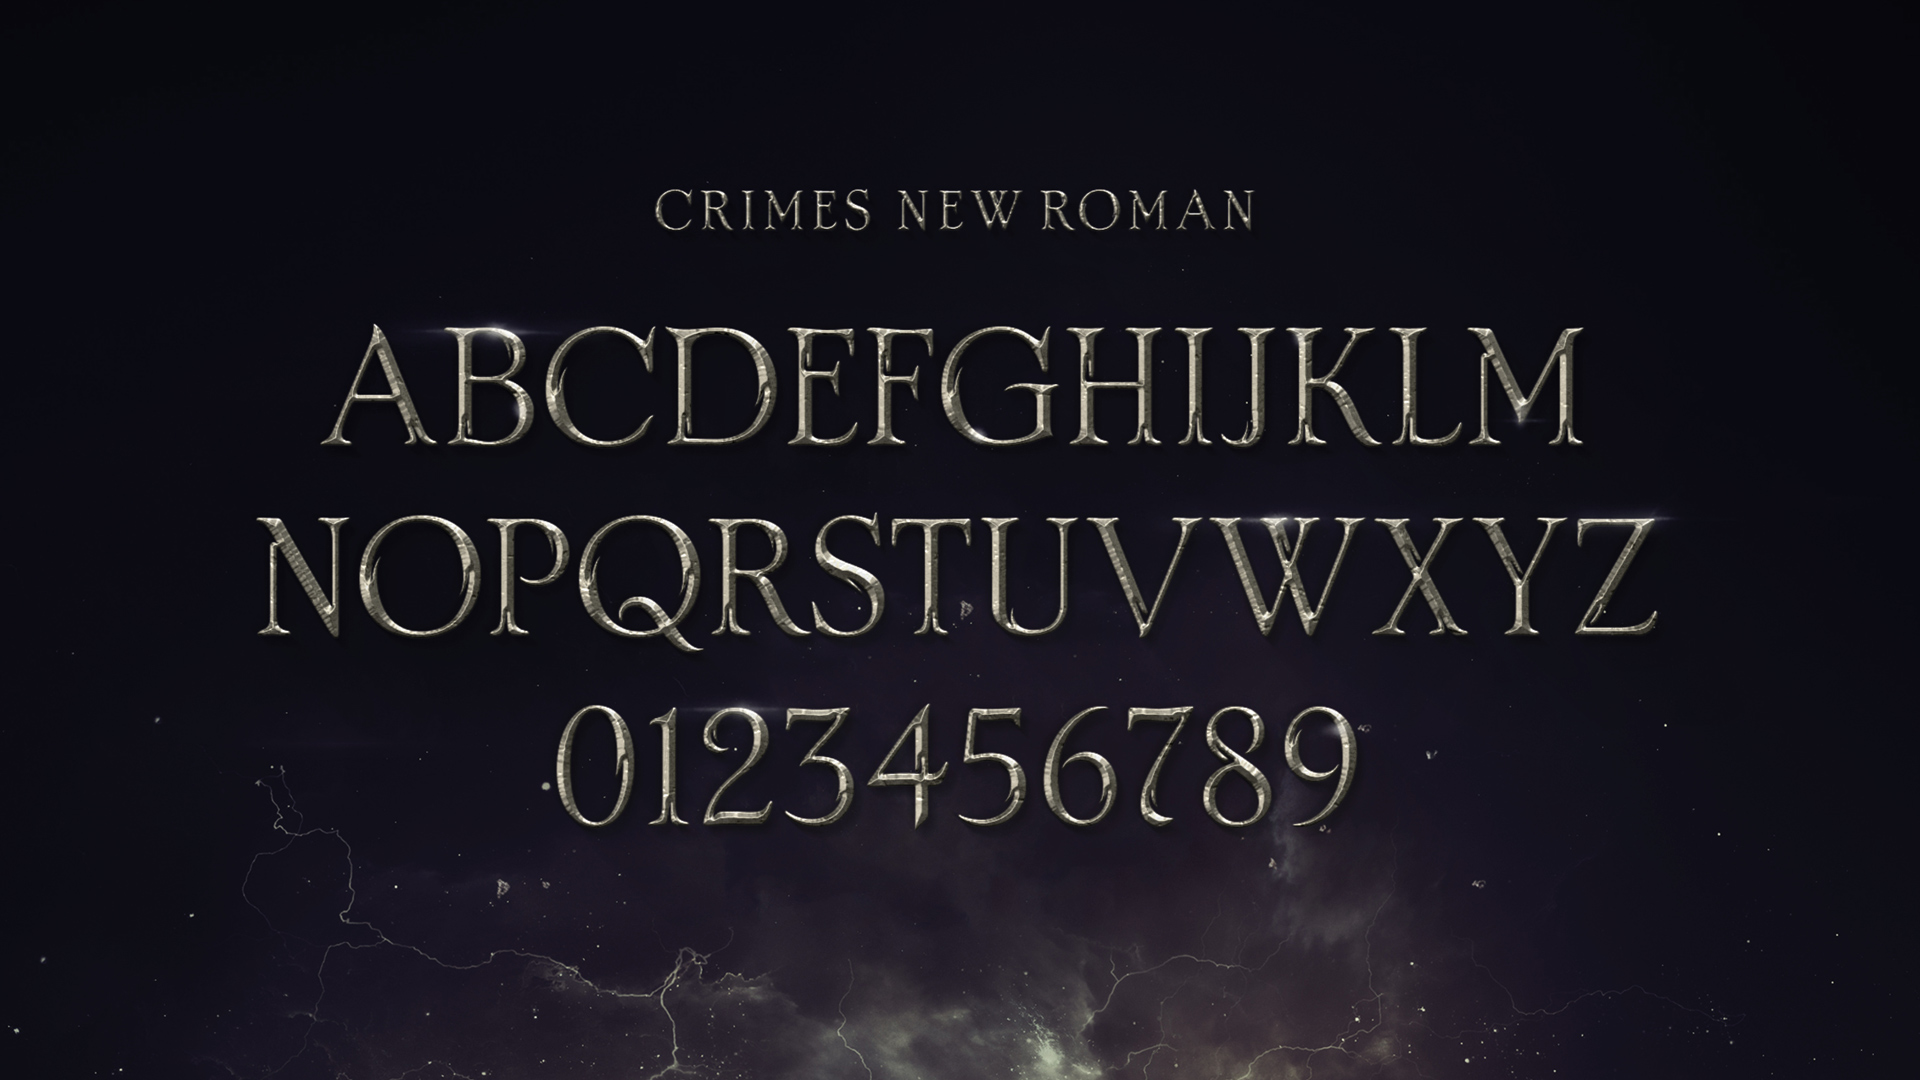 houtz_crimesofgrindelwald_crimesnewroman.jpg